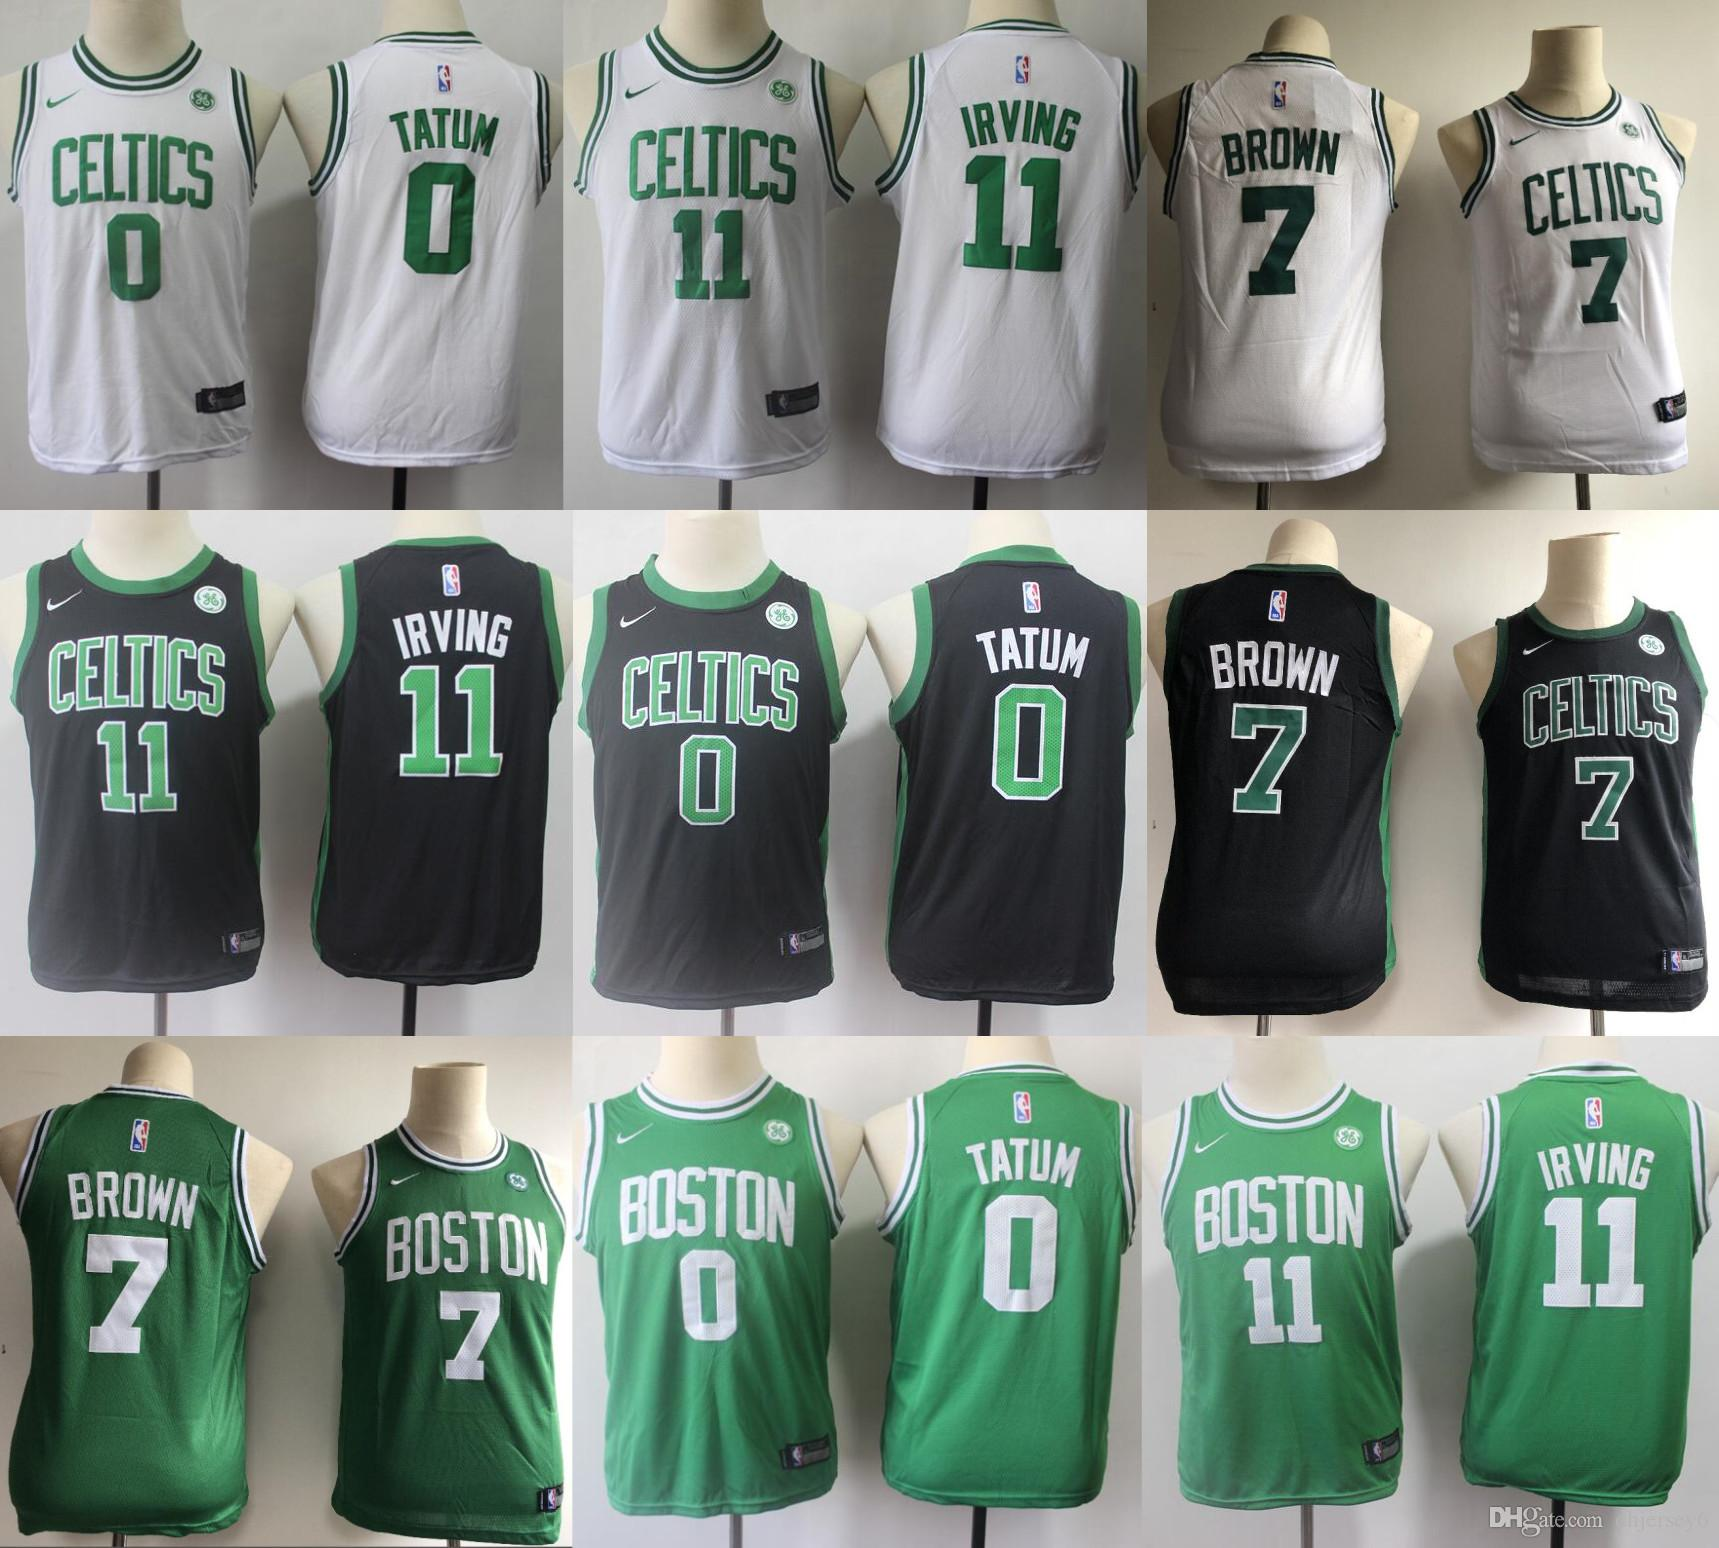 best service eaa45 7ce6d 11 Irving Jayson 0 Tatum Boston Jersey Celtic Jaylen 7 Brown 42 Horford  Gordon 20 Hayward Youth Kids Basketball Jerseys